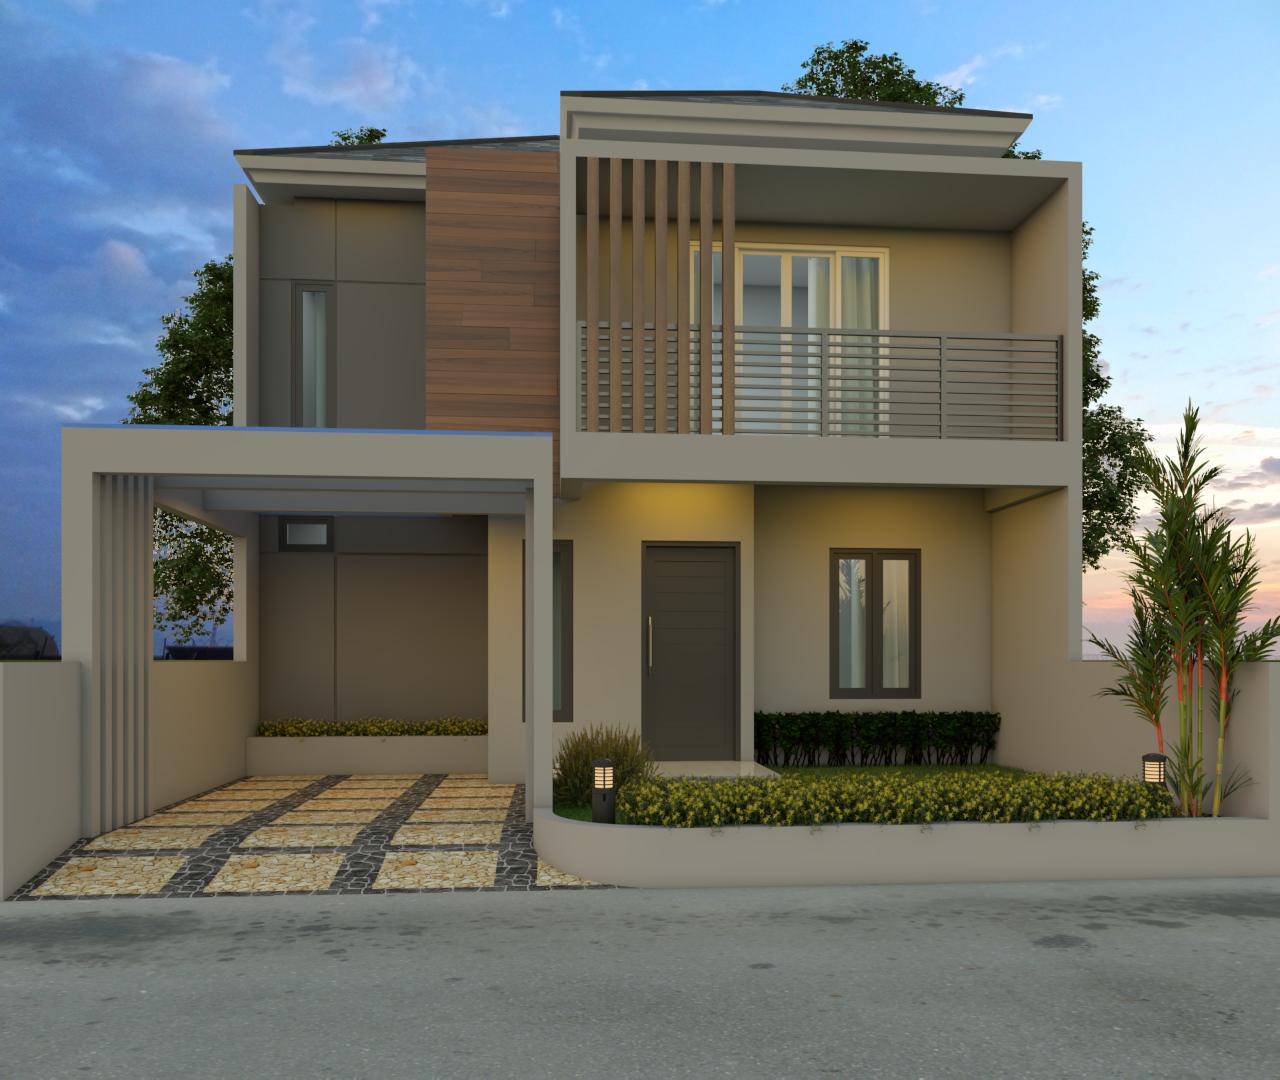 4.Denoiser 1 - Desain Rumah Minimalis 2 Lantai